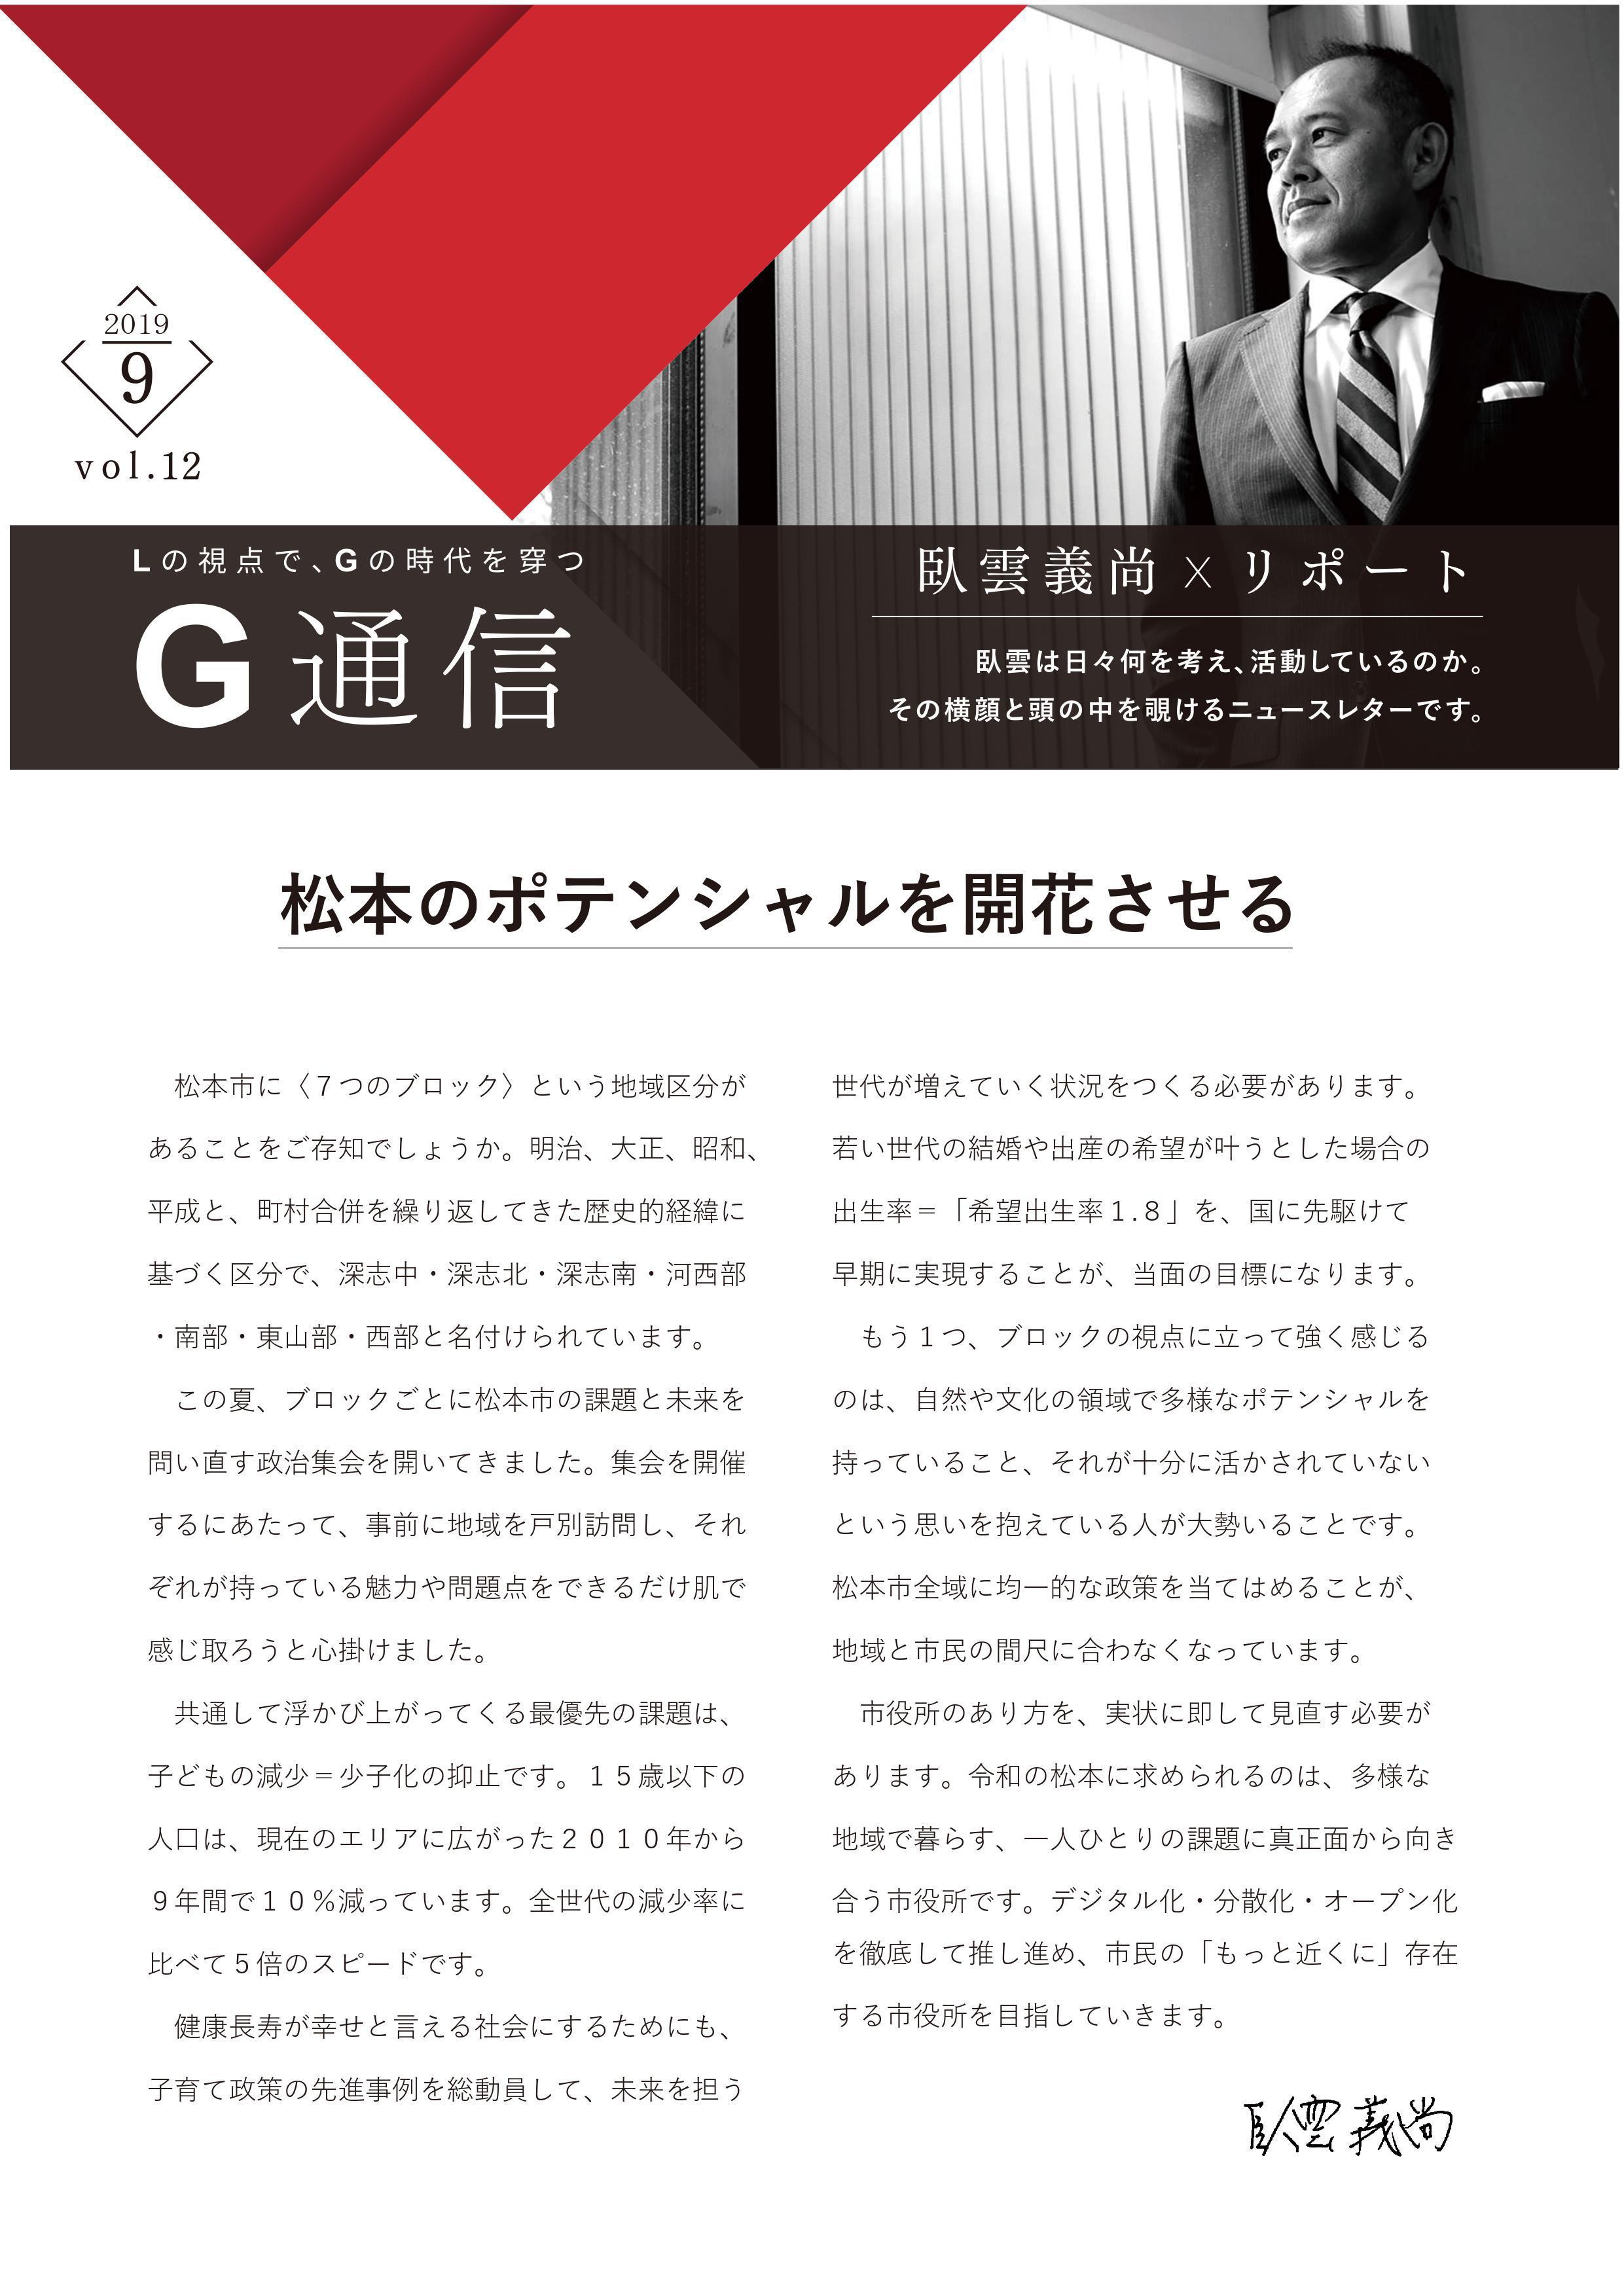 G通信Vol.12 松本のポテンシャルを開花させる